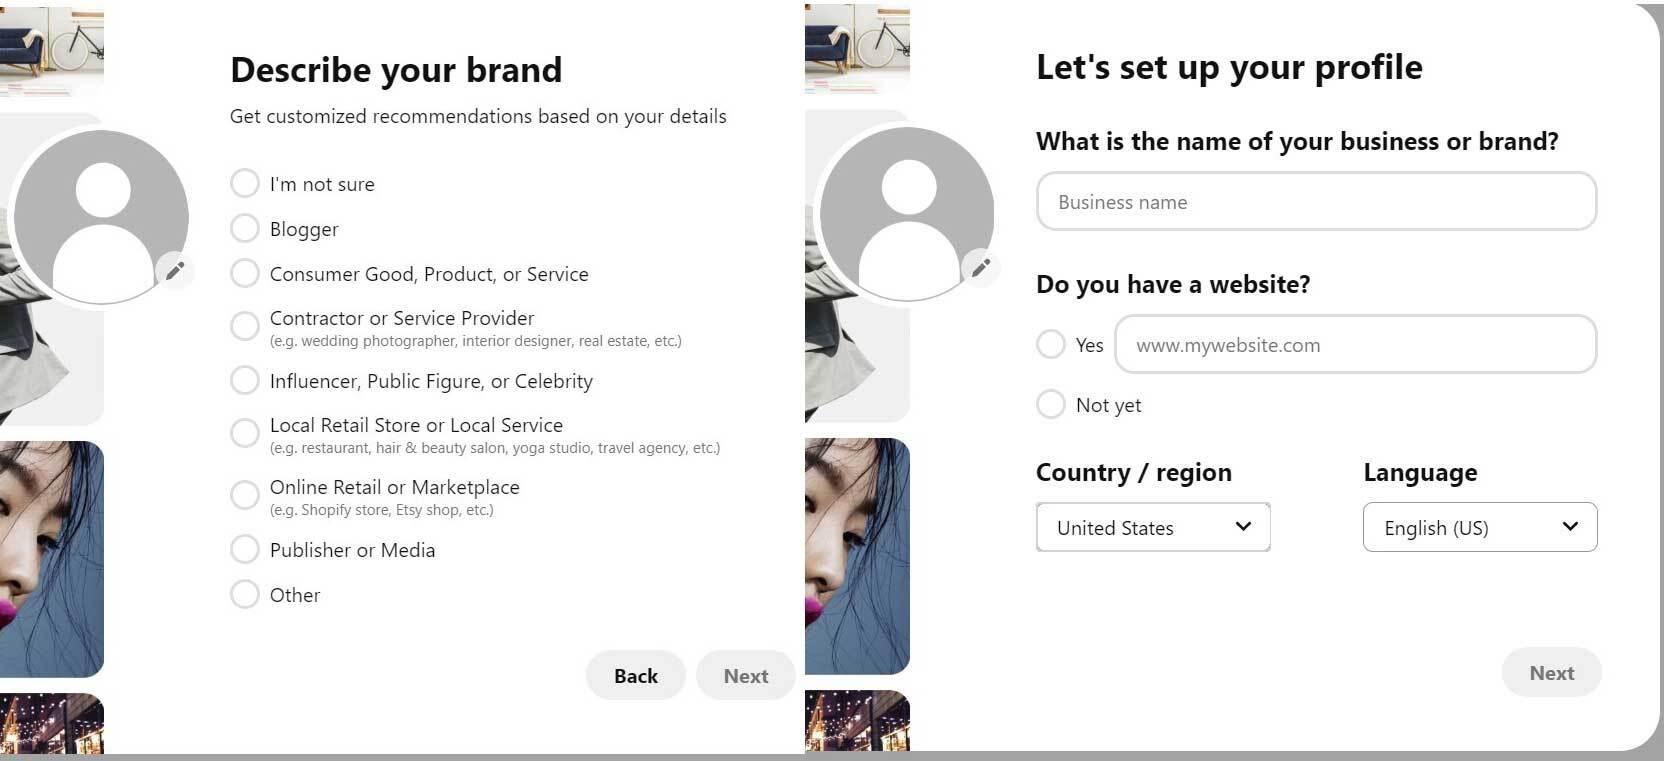 Pinterest describe your brand window